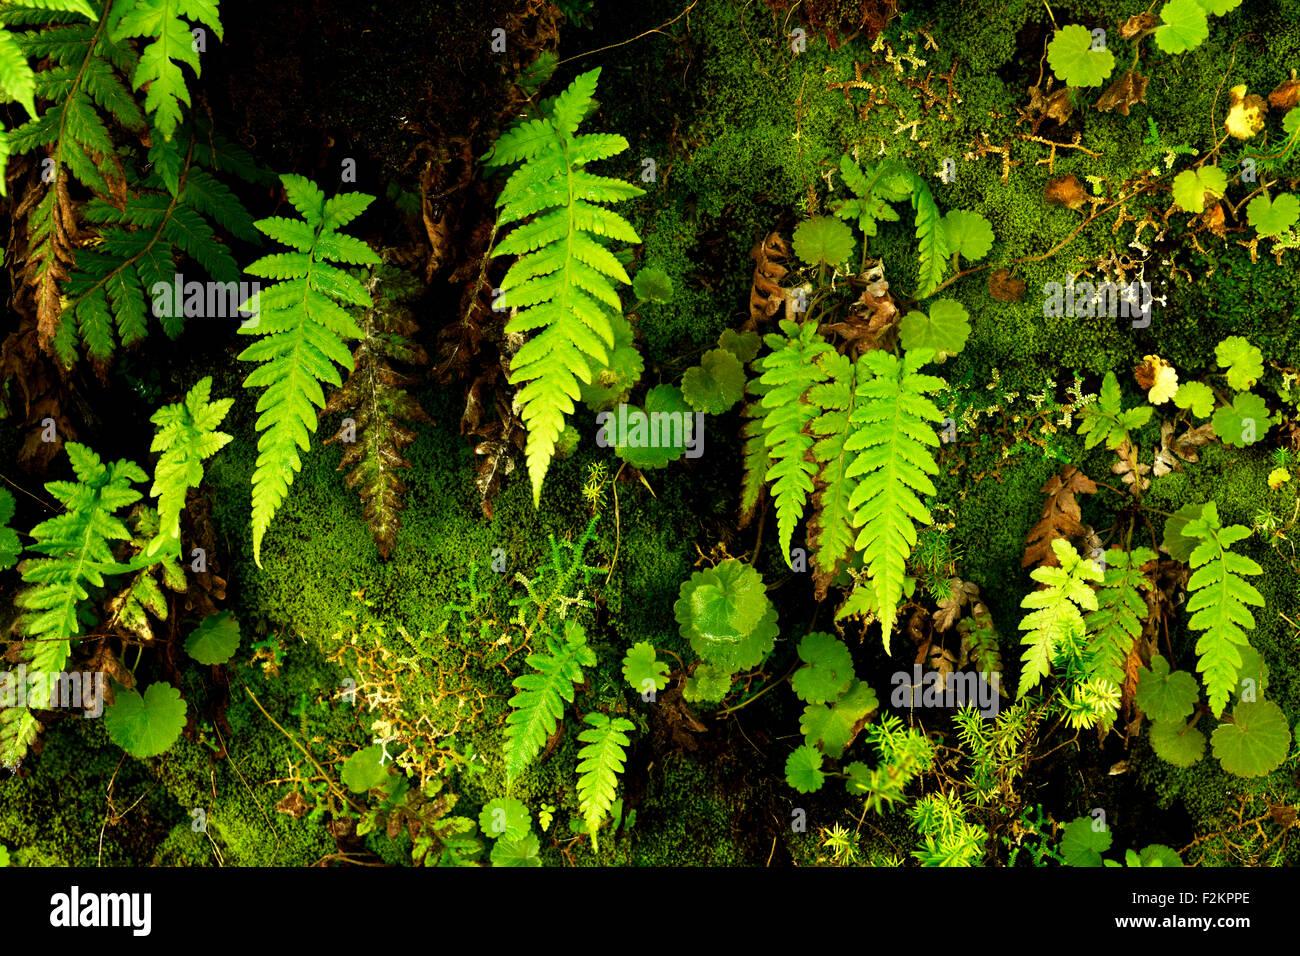 Rock wall with ferns (Polypodiopsida, Filicopsida) growing on it, Rabaçal, Madeira, Portugal Stock Photo